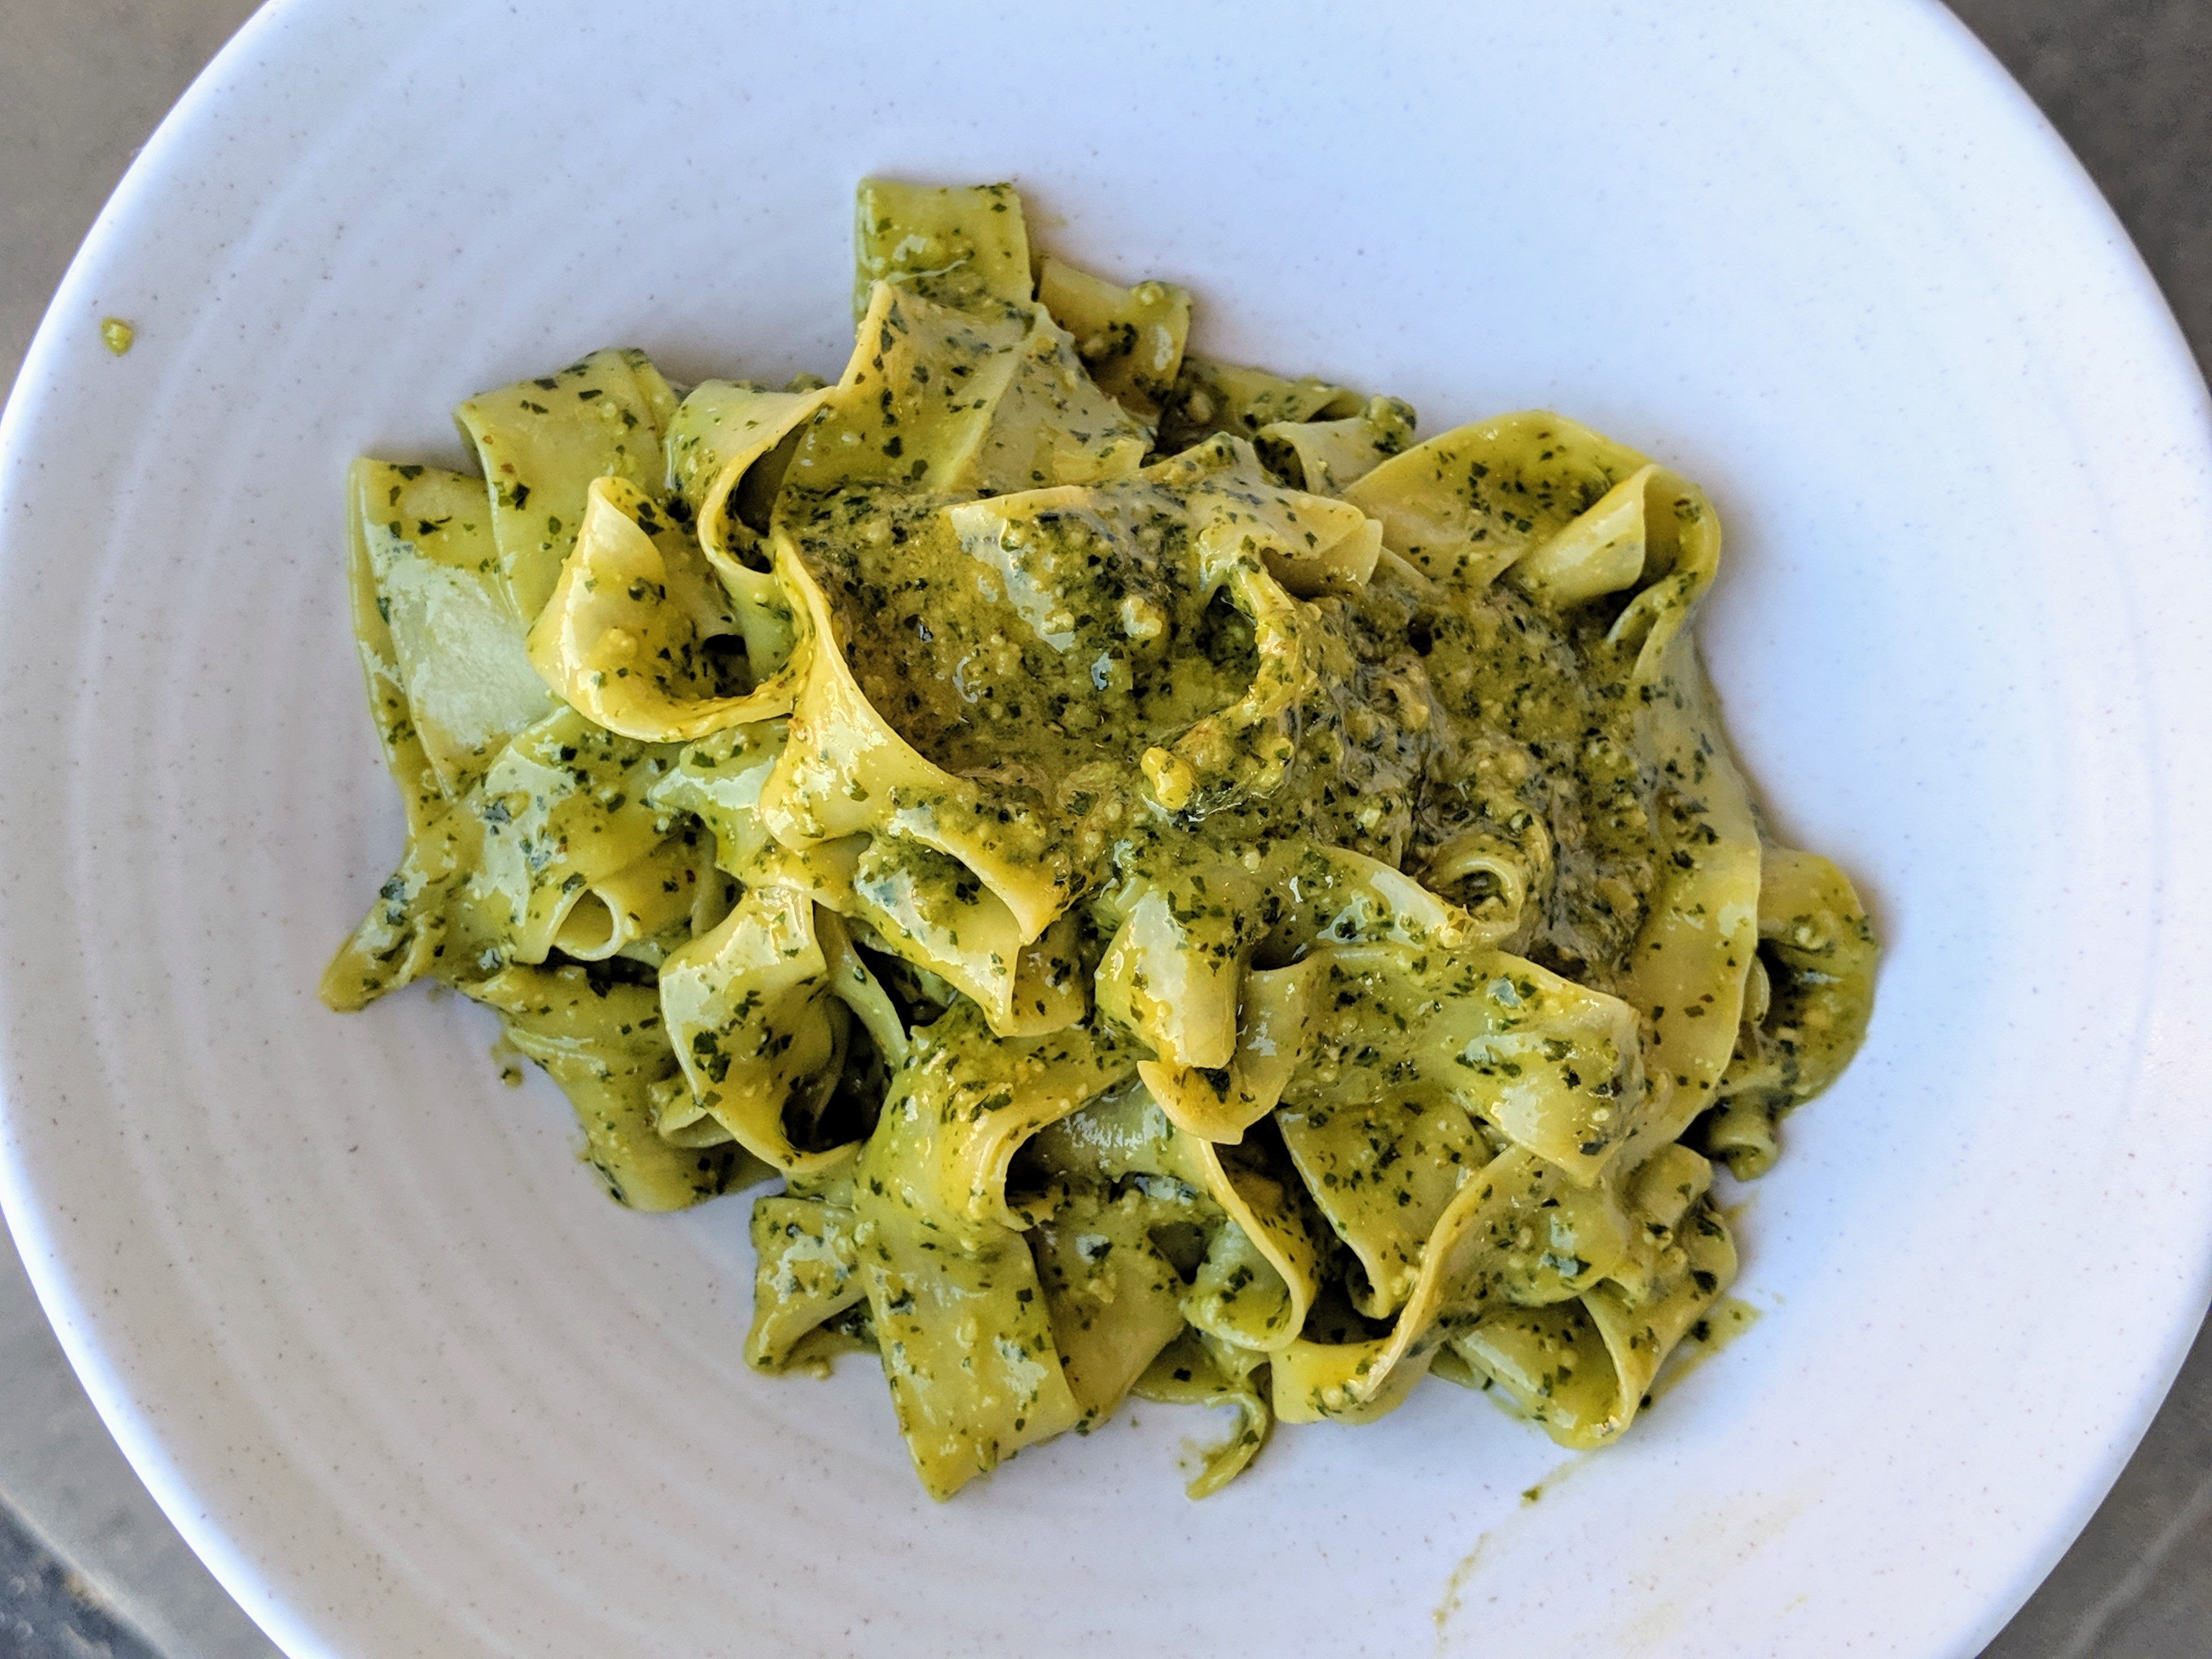 New Italian Spot Brings Reasonably Priced Handmade Pastas to Redondo Beach